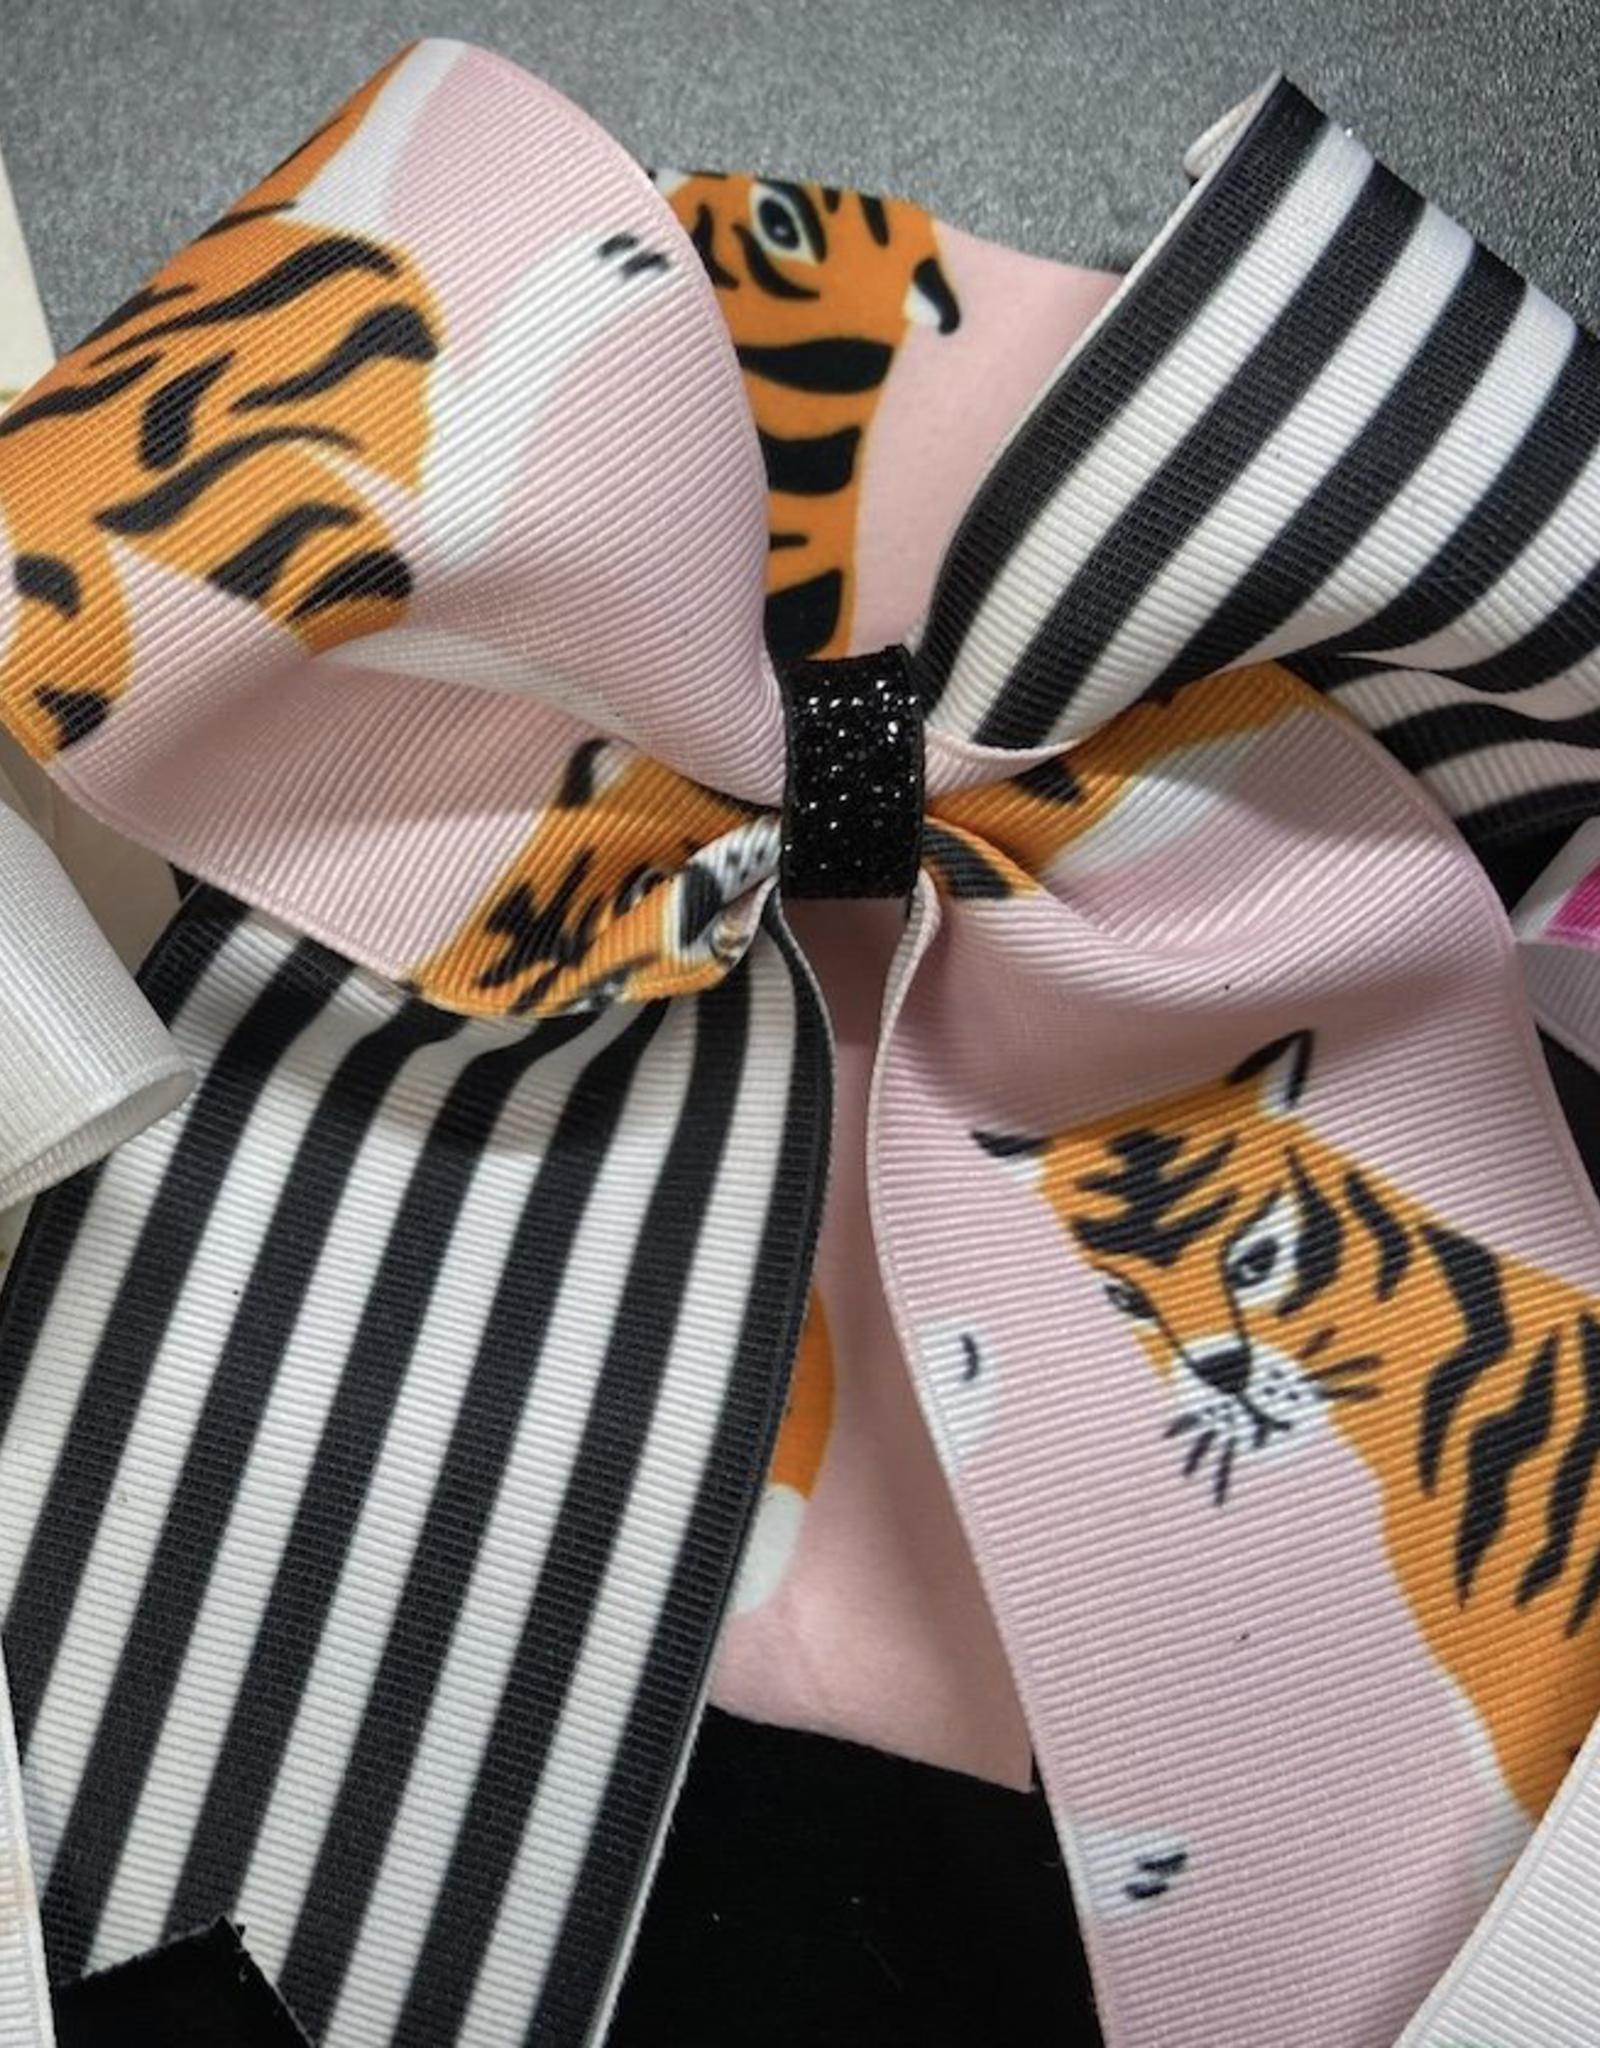 Lil Divas Dancewear Bow in Tiger Queen